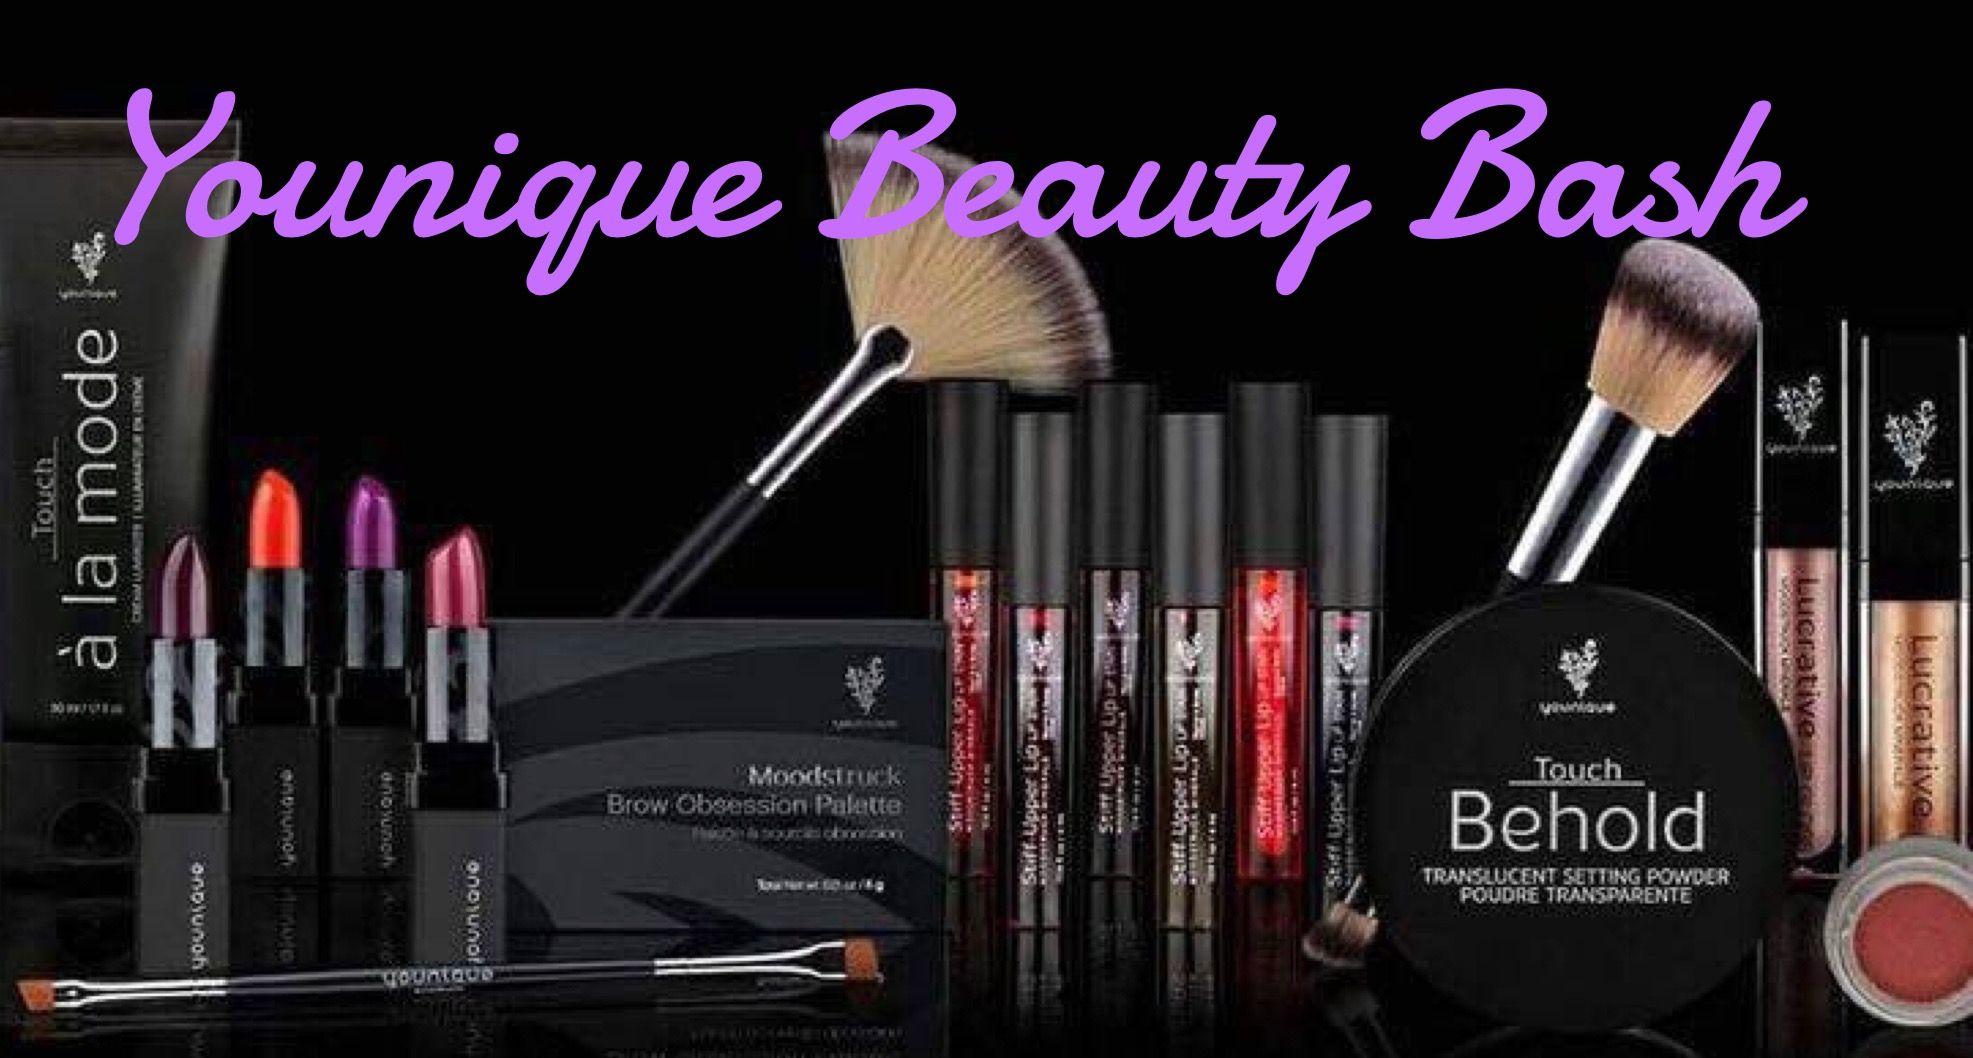 0806e50182c Beauty Bash Cover Photo! #Younique #ClickImageToShop #Questions #EmailMe  sarahandbrianyounique@gmail.com or comment below